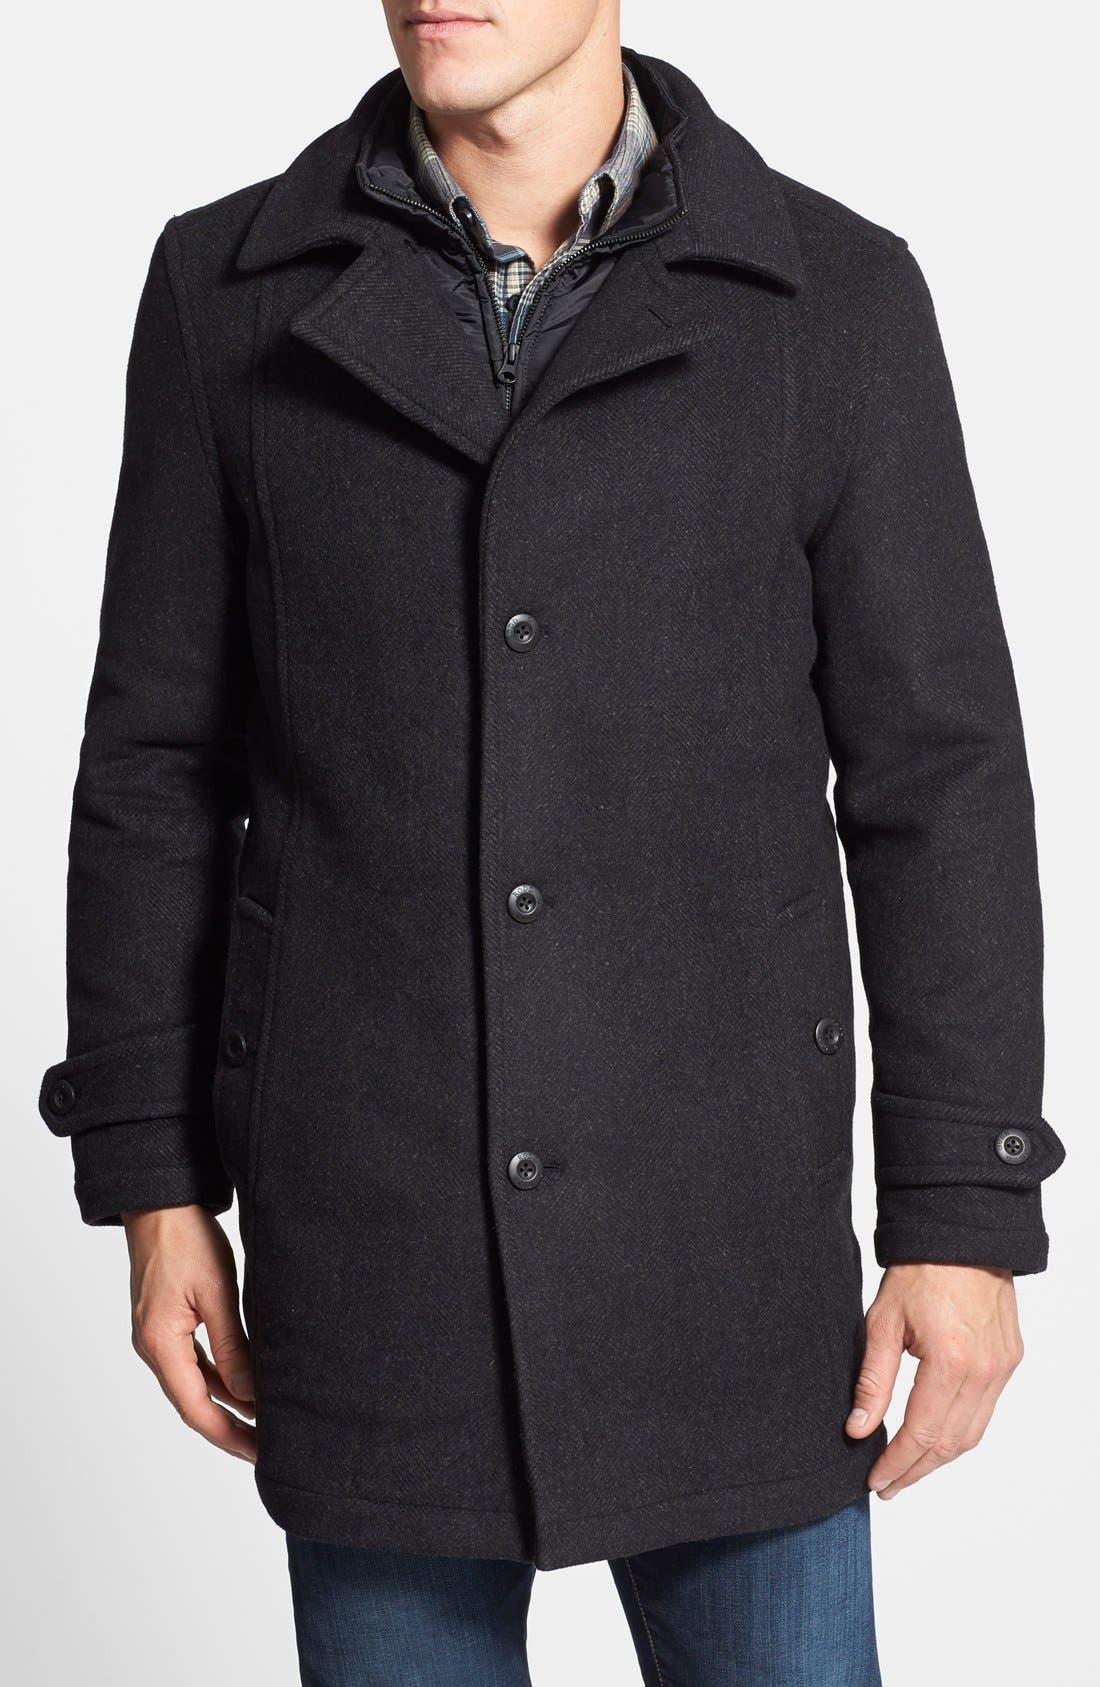 'Westown' 3-in-1 Wool Blend Coat,                             Main thumbnail 2, color,